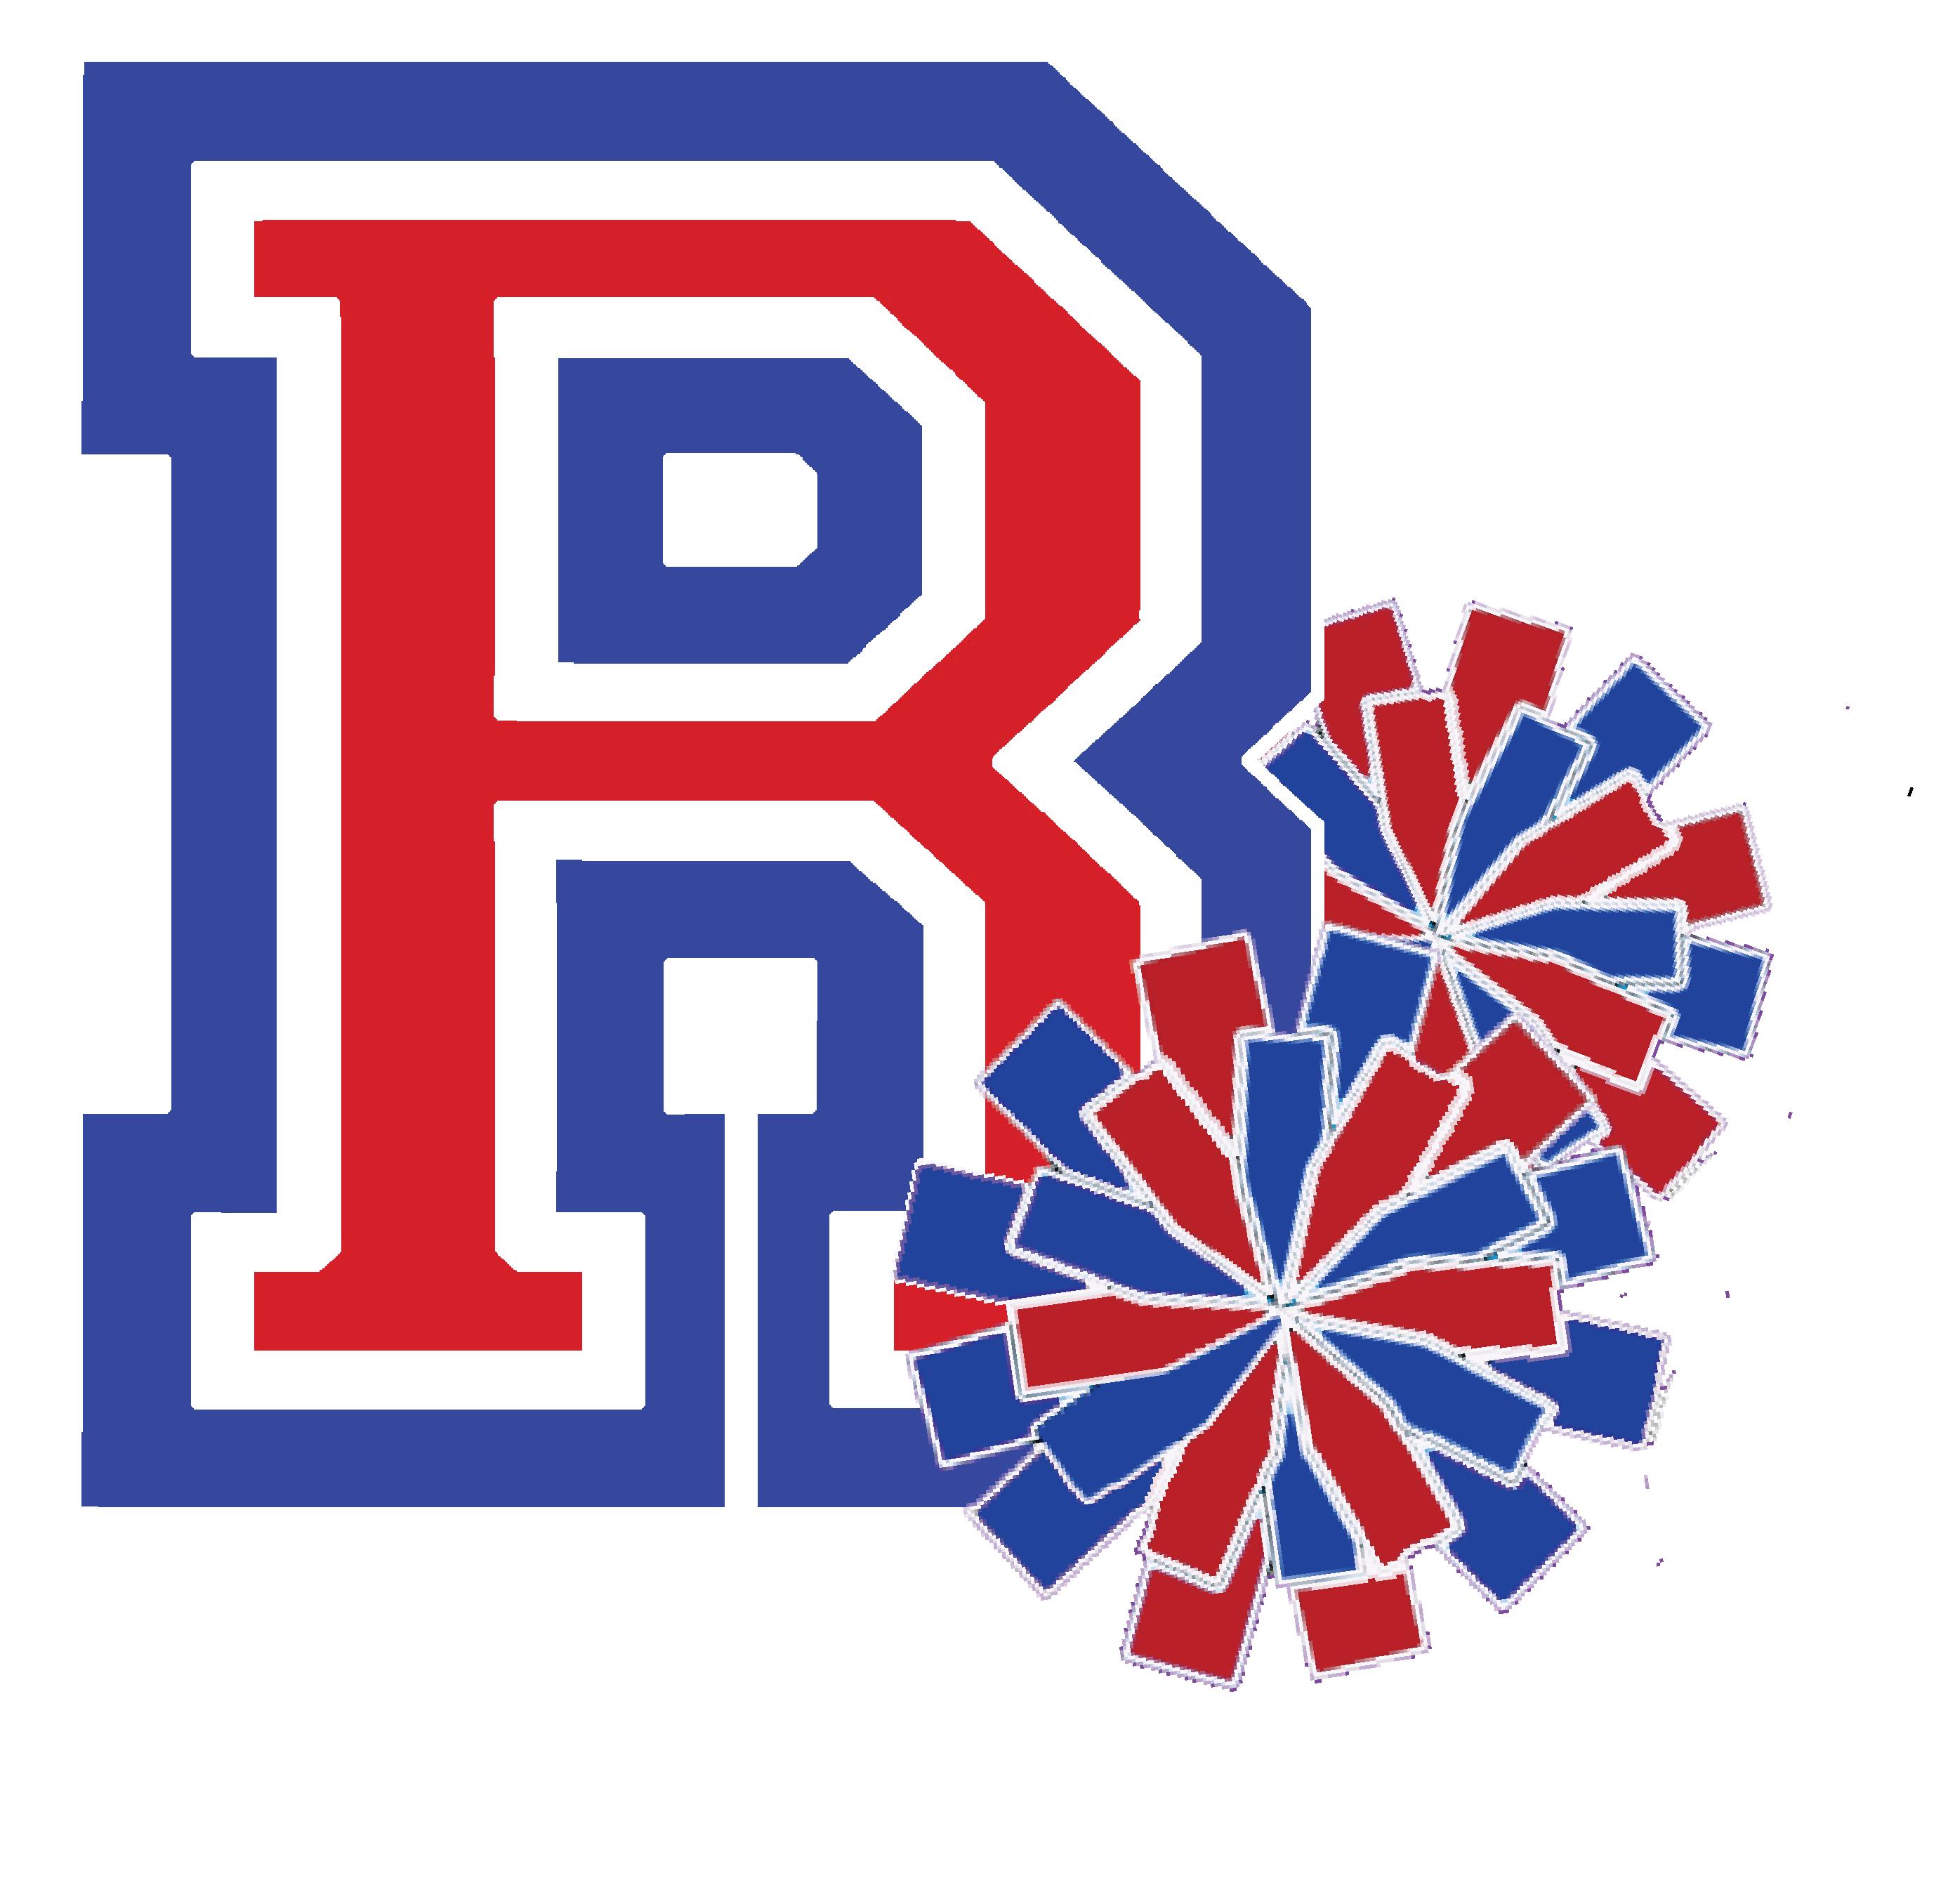 Grade school boys basketball and cheerleaders clipart jpg freeuse download Cheerleaders – Richfield High School jpg freeuse download